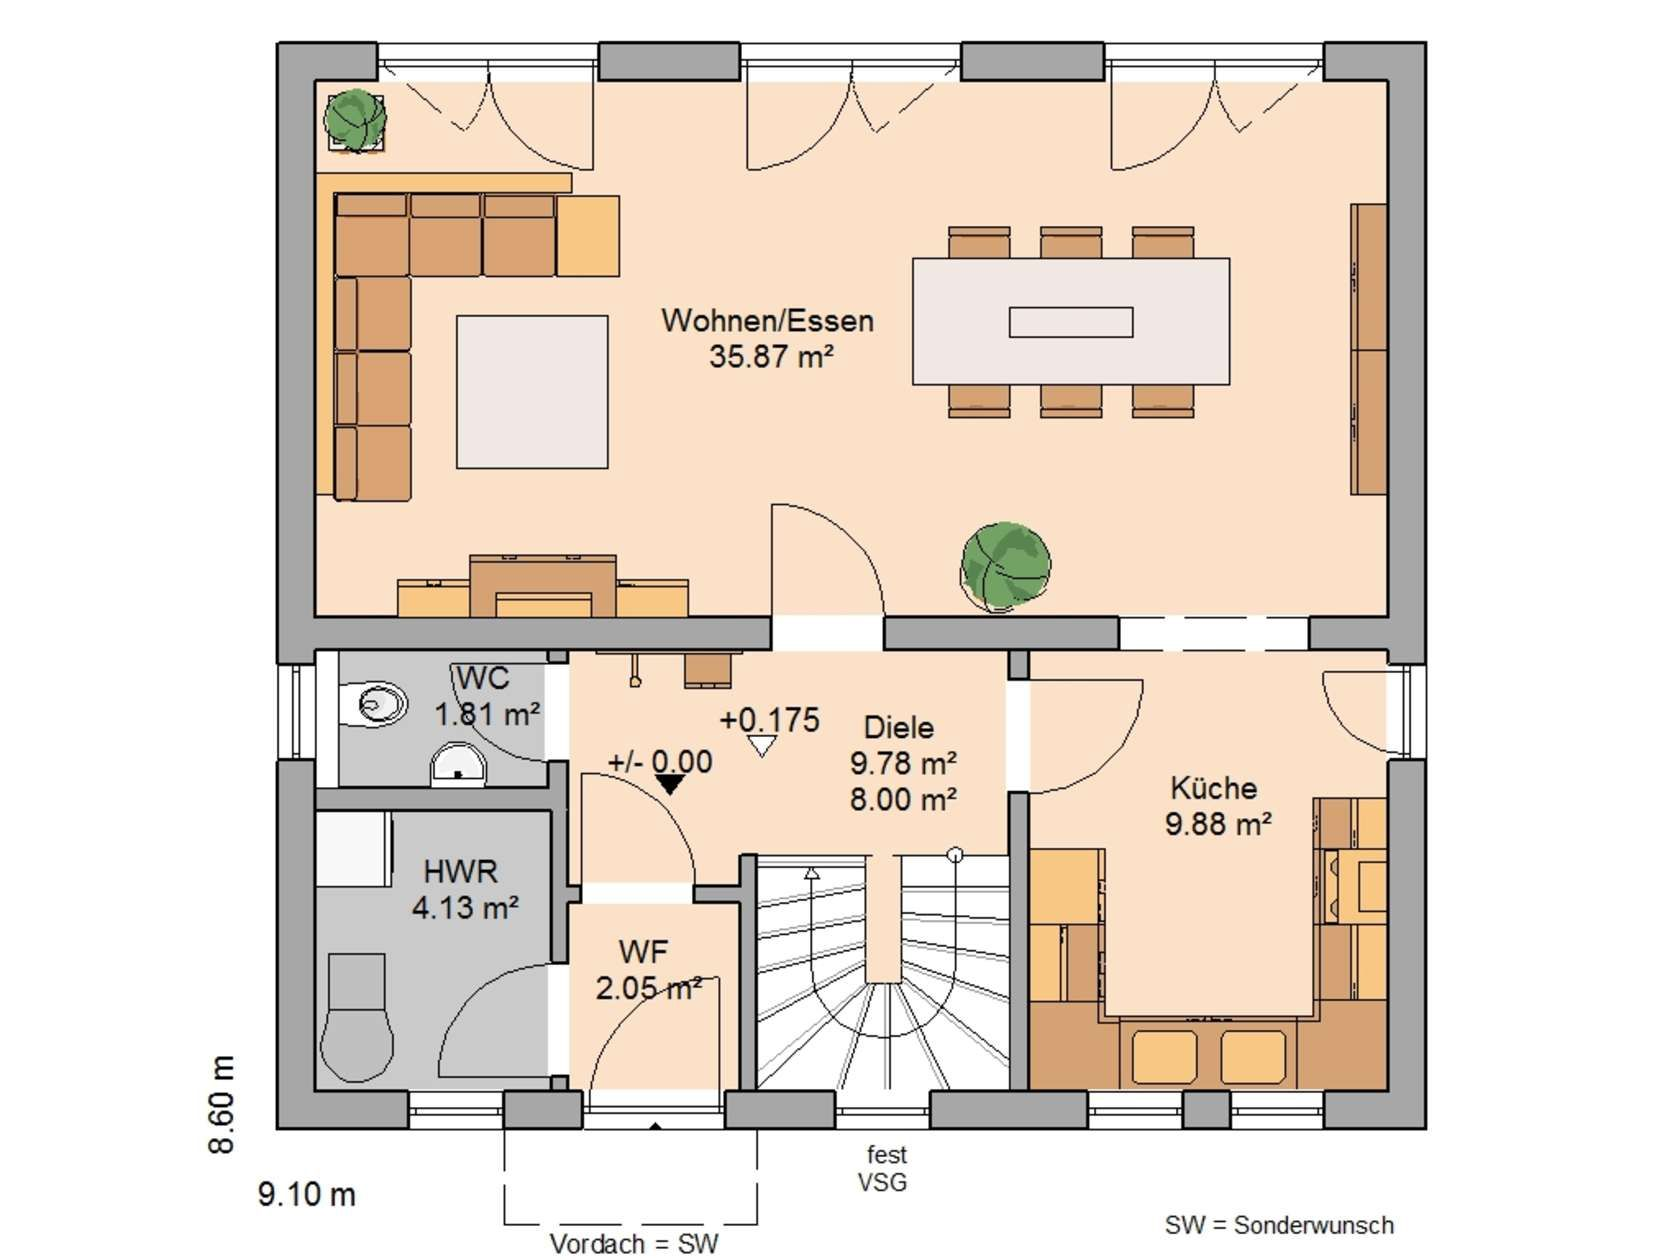 Hausbeispiele grundrisse  Kern-Haus Familienhaus Vision Grundriss Erdgeschoss | Endauswahl ...